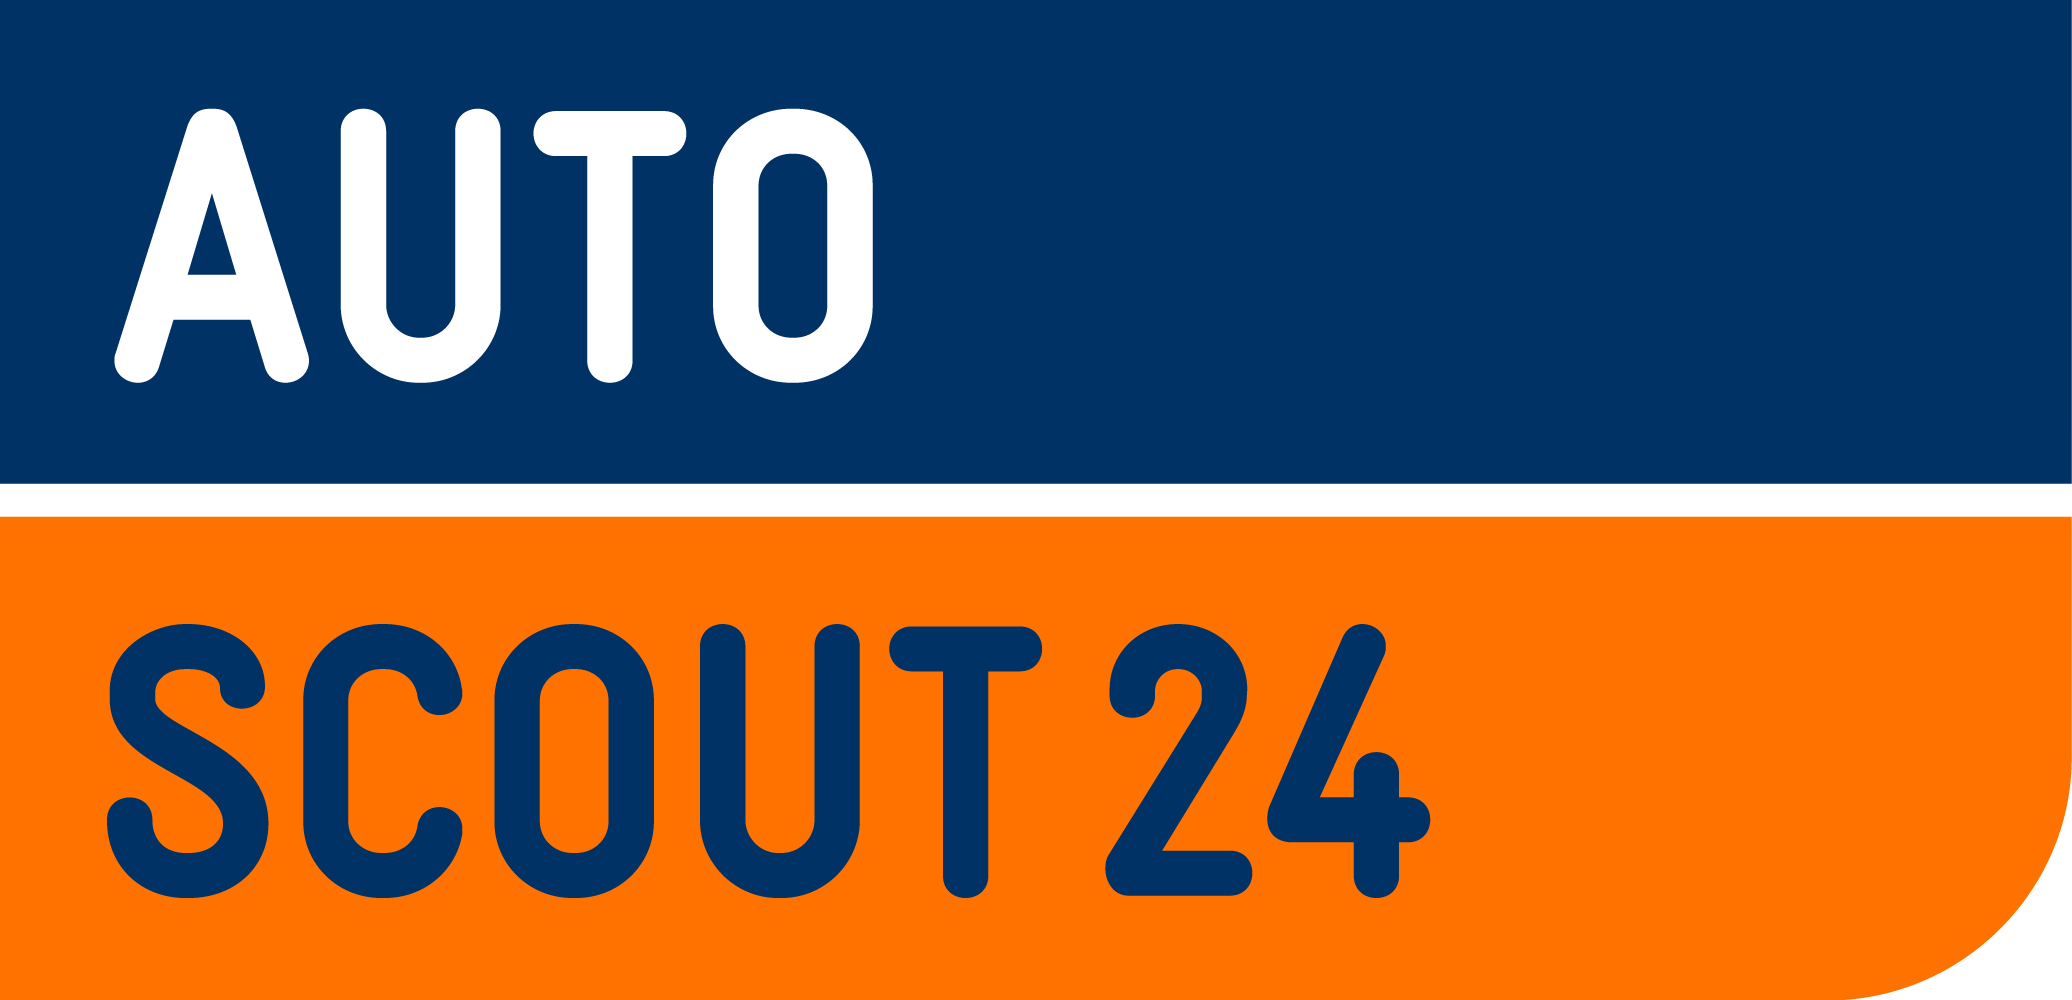 Autoscout24 Logo png